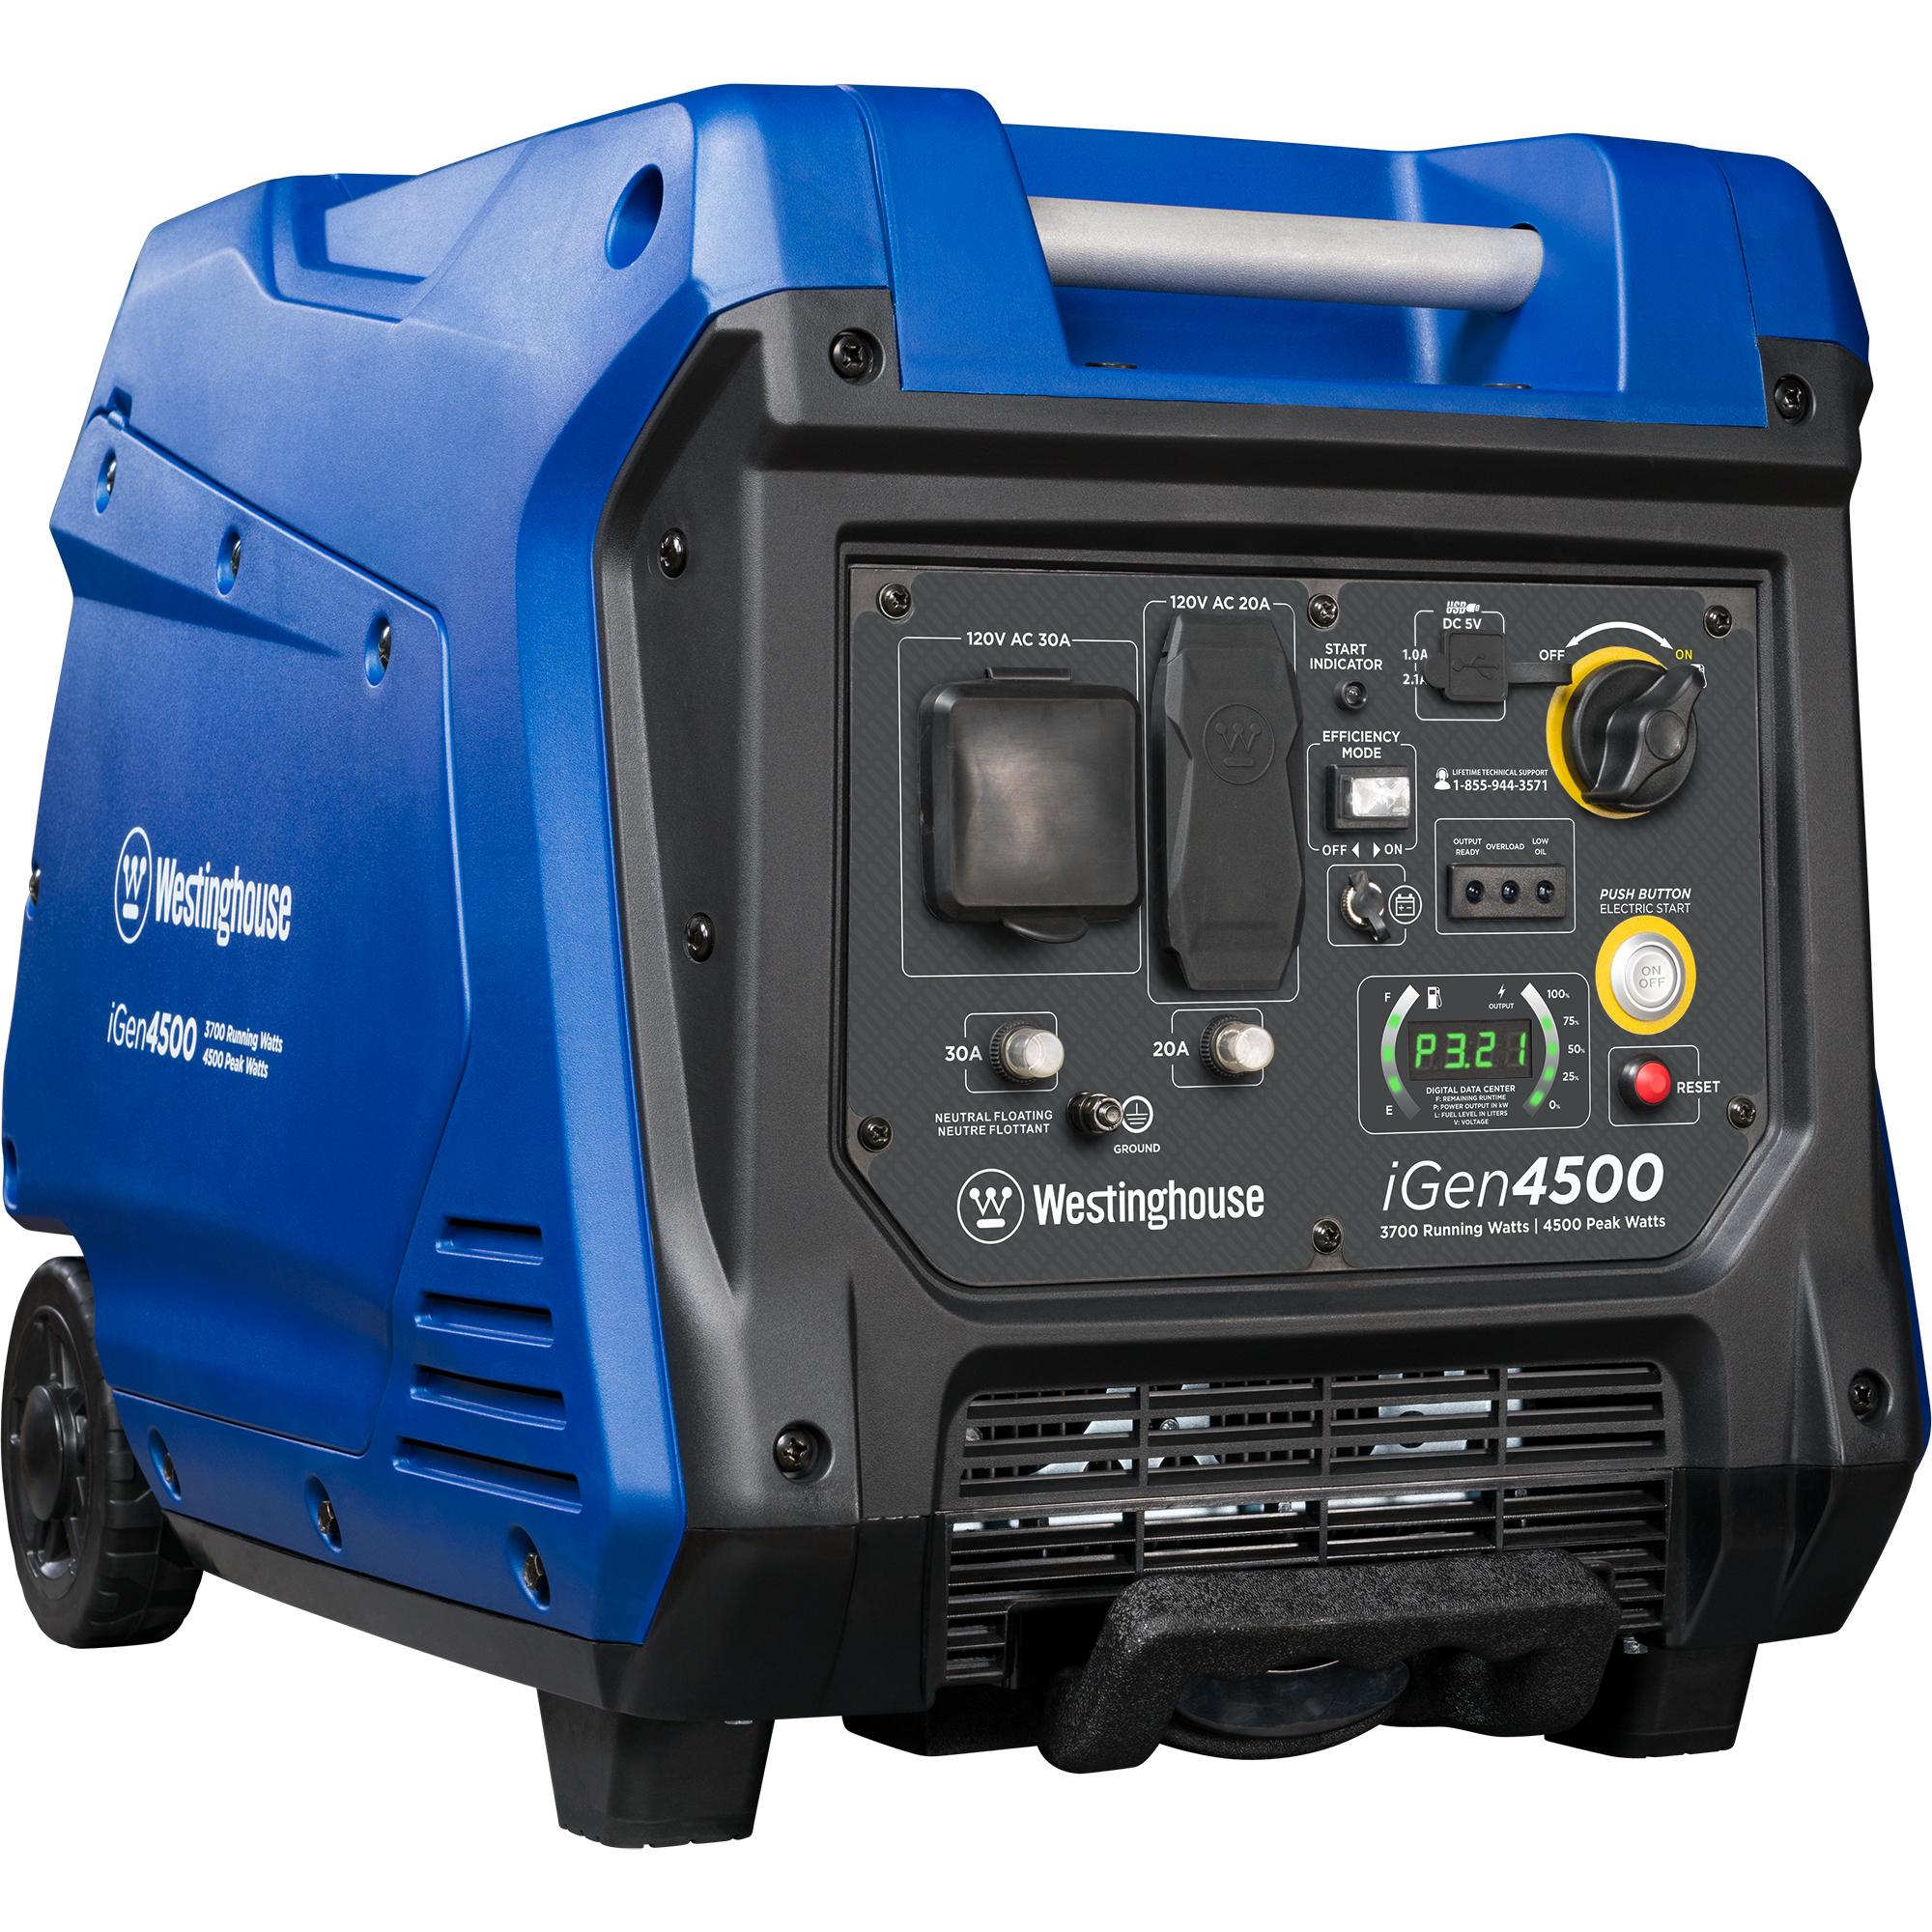 Westinghouse iGen4500 Gas Powered Portable Inverter Generator